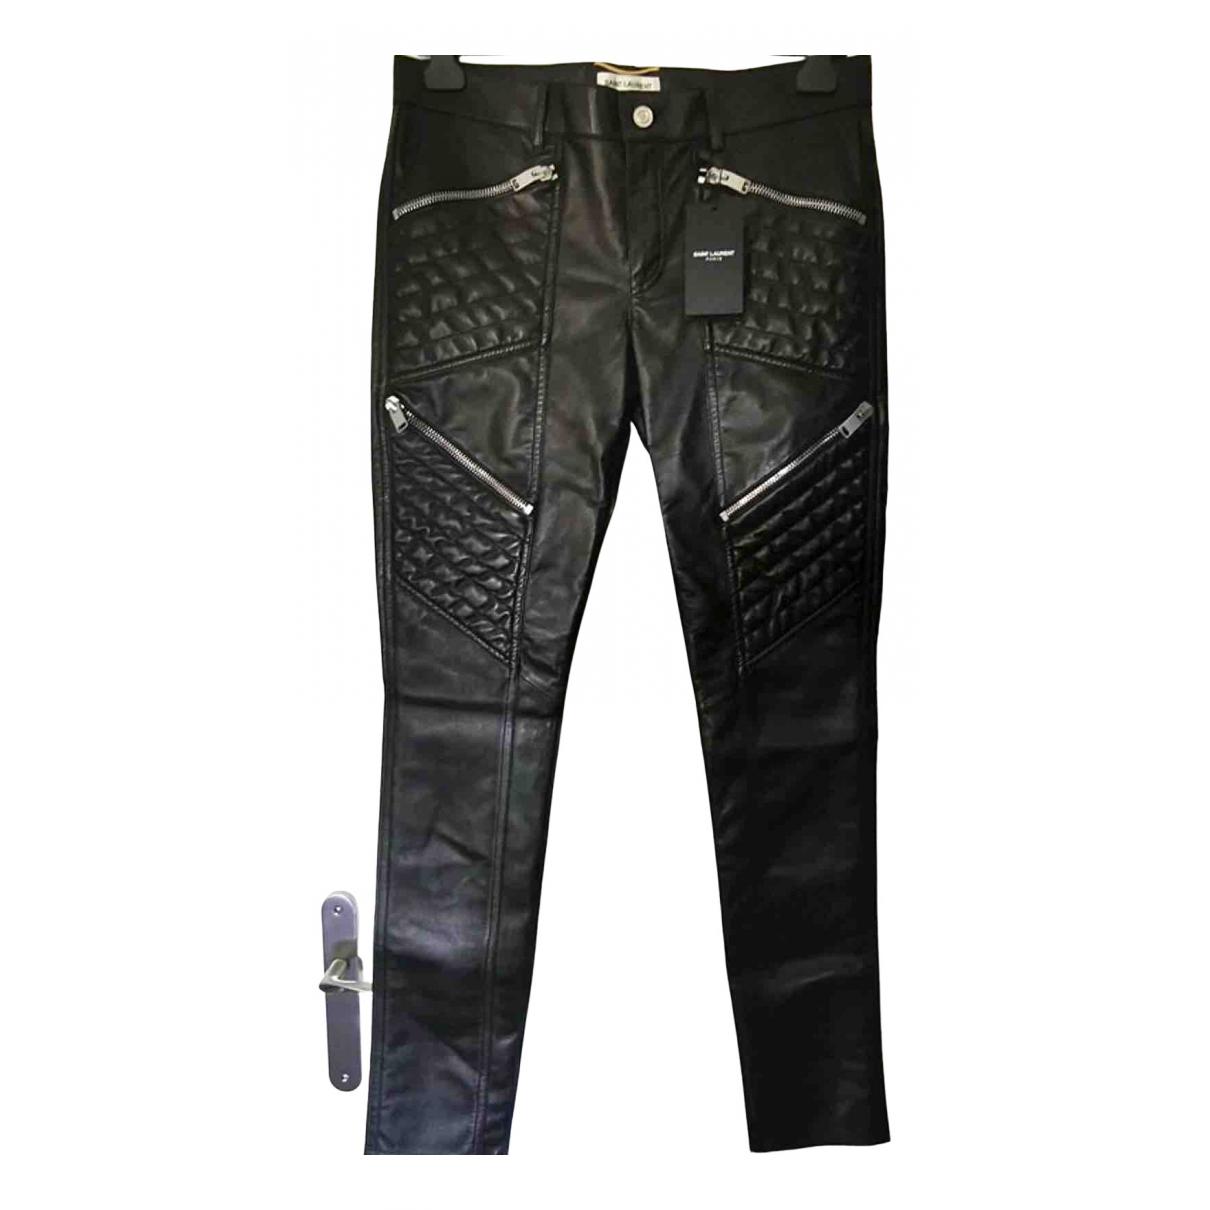 Saint Laurent N Black Leather Trousers for Women 42 FR